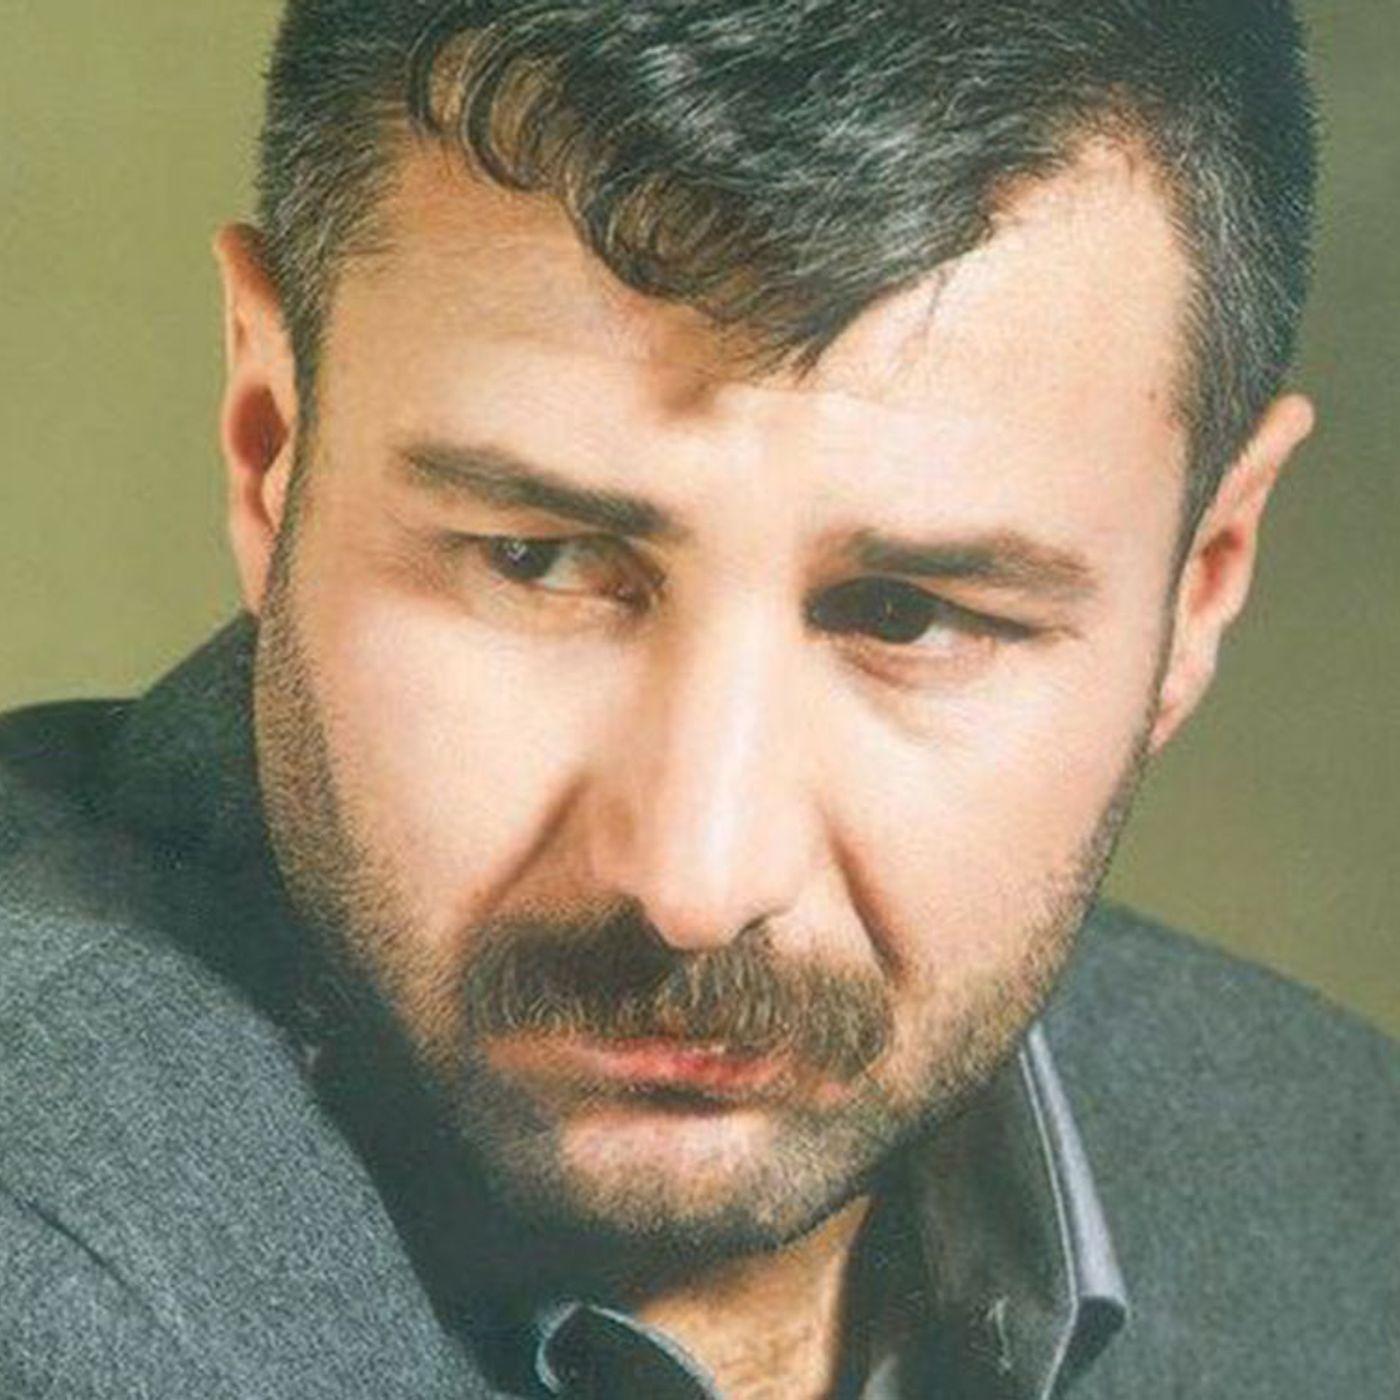 Azer Bülbül - Canım Yanıyor Arabesk Trap Remix (Mintokal Music)